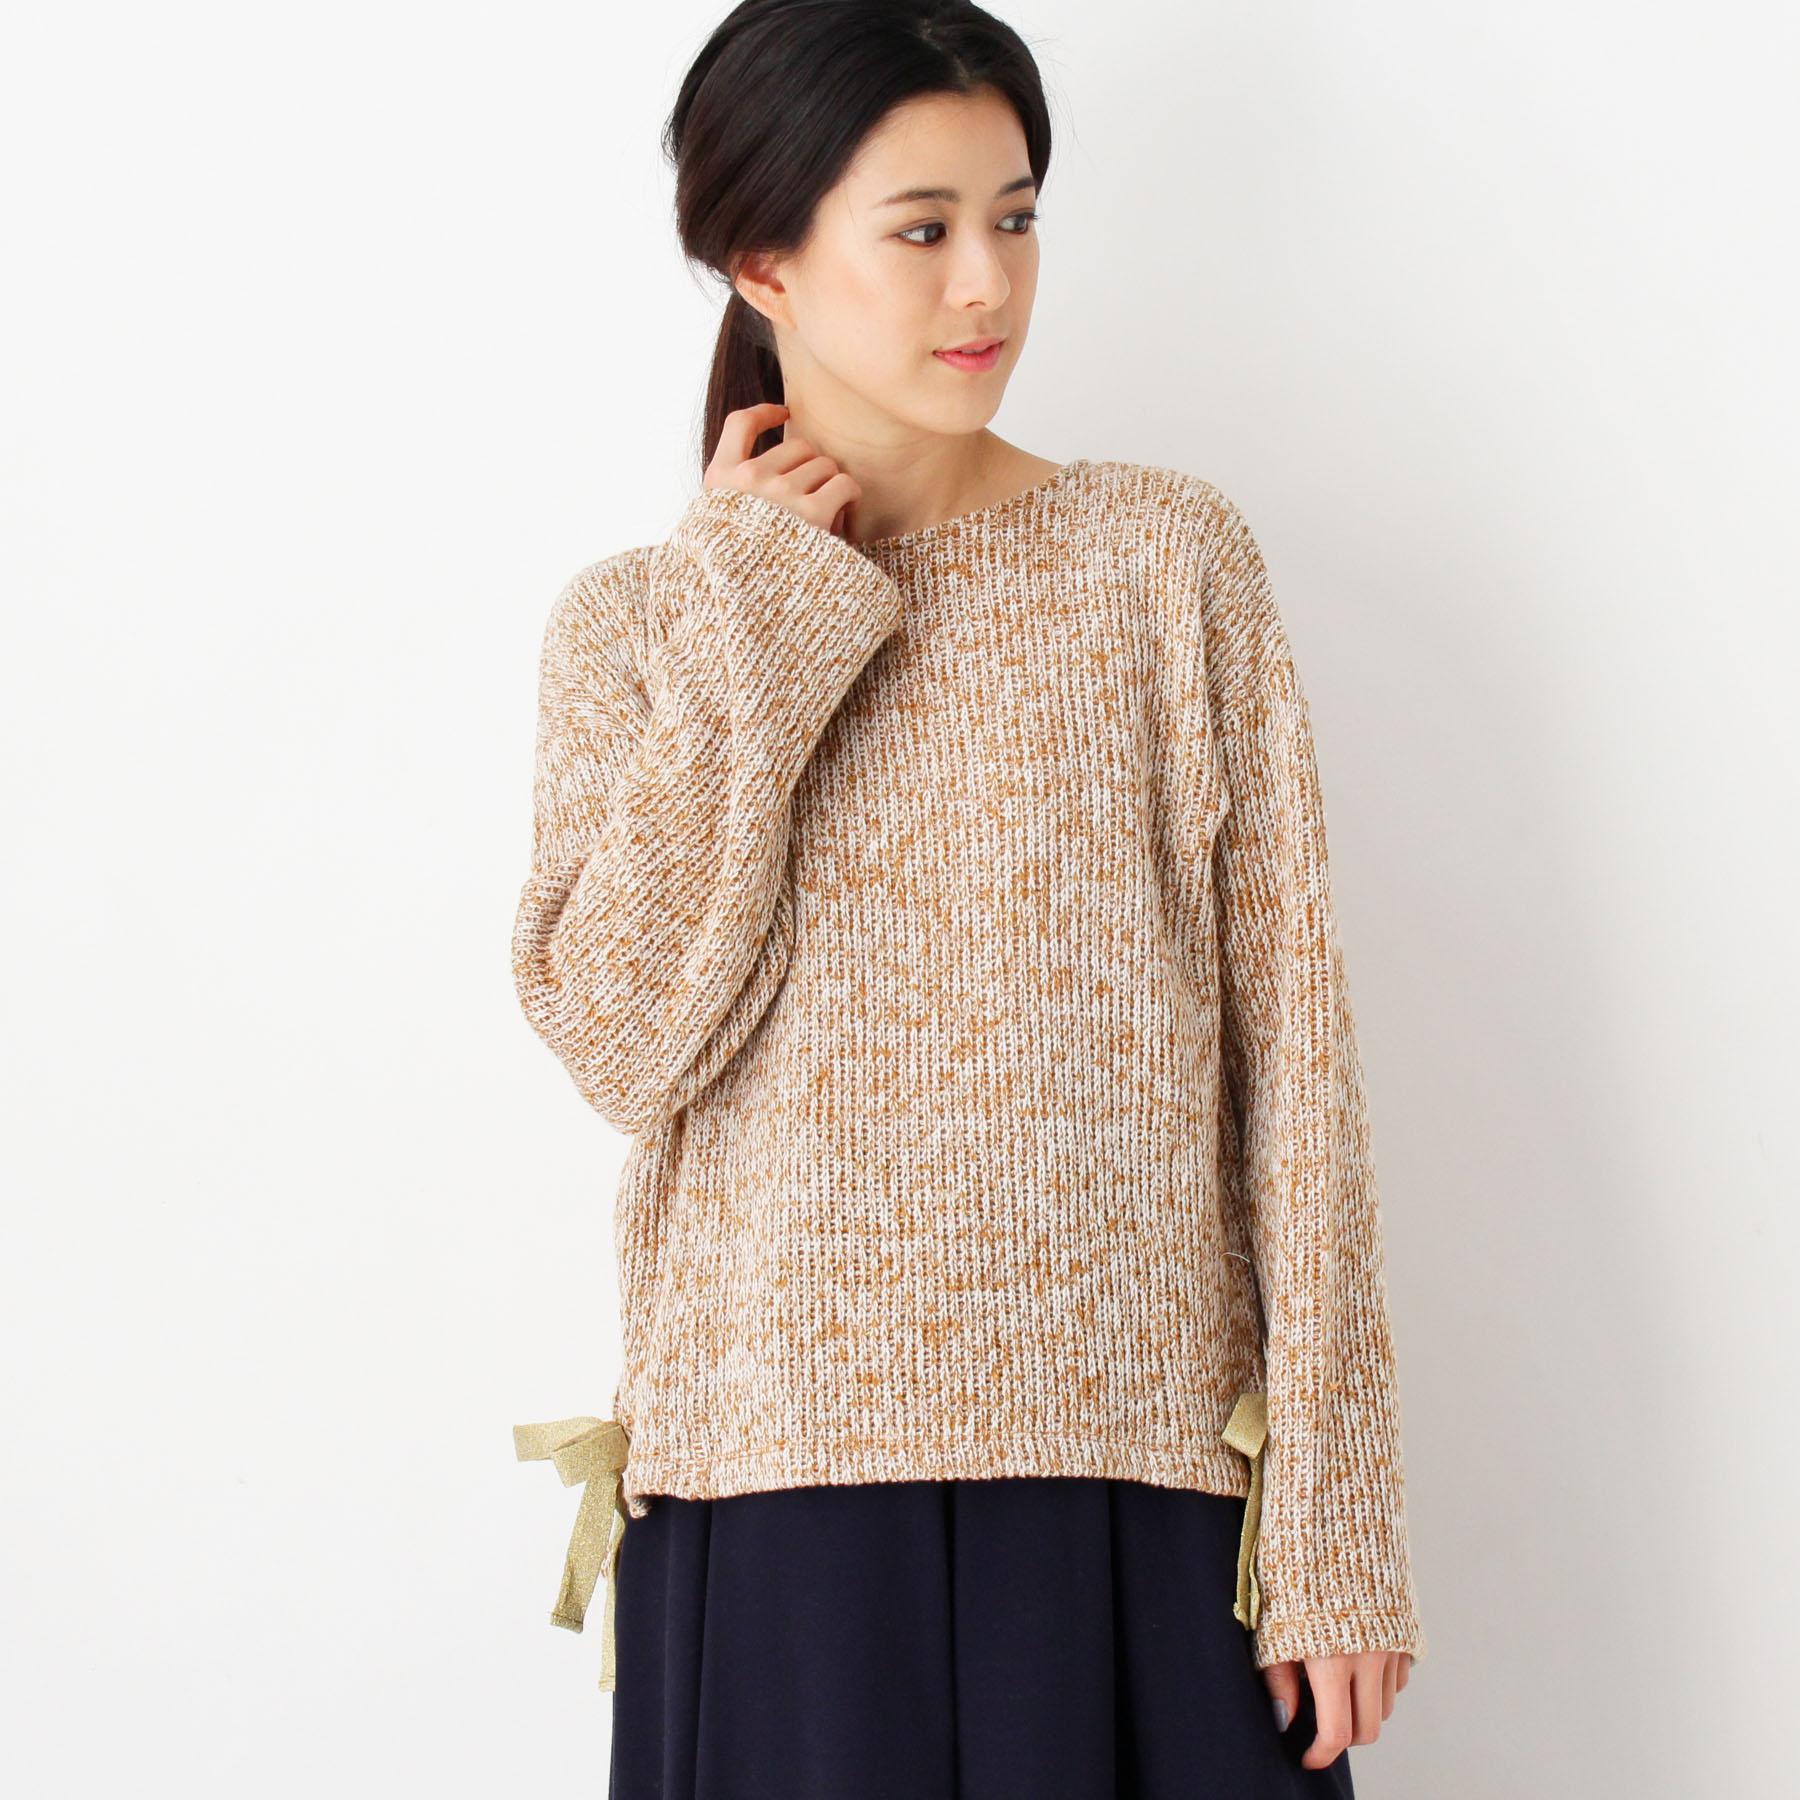 【index (インデックス)】裾リボンツイード風ニットレディース トップス|セーター サンドベージュ